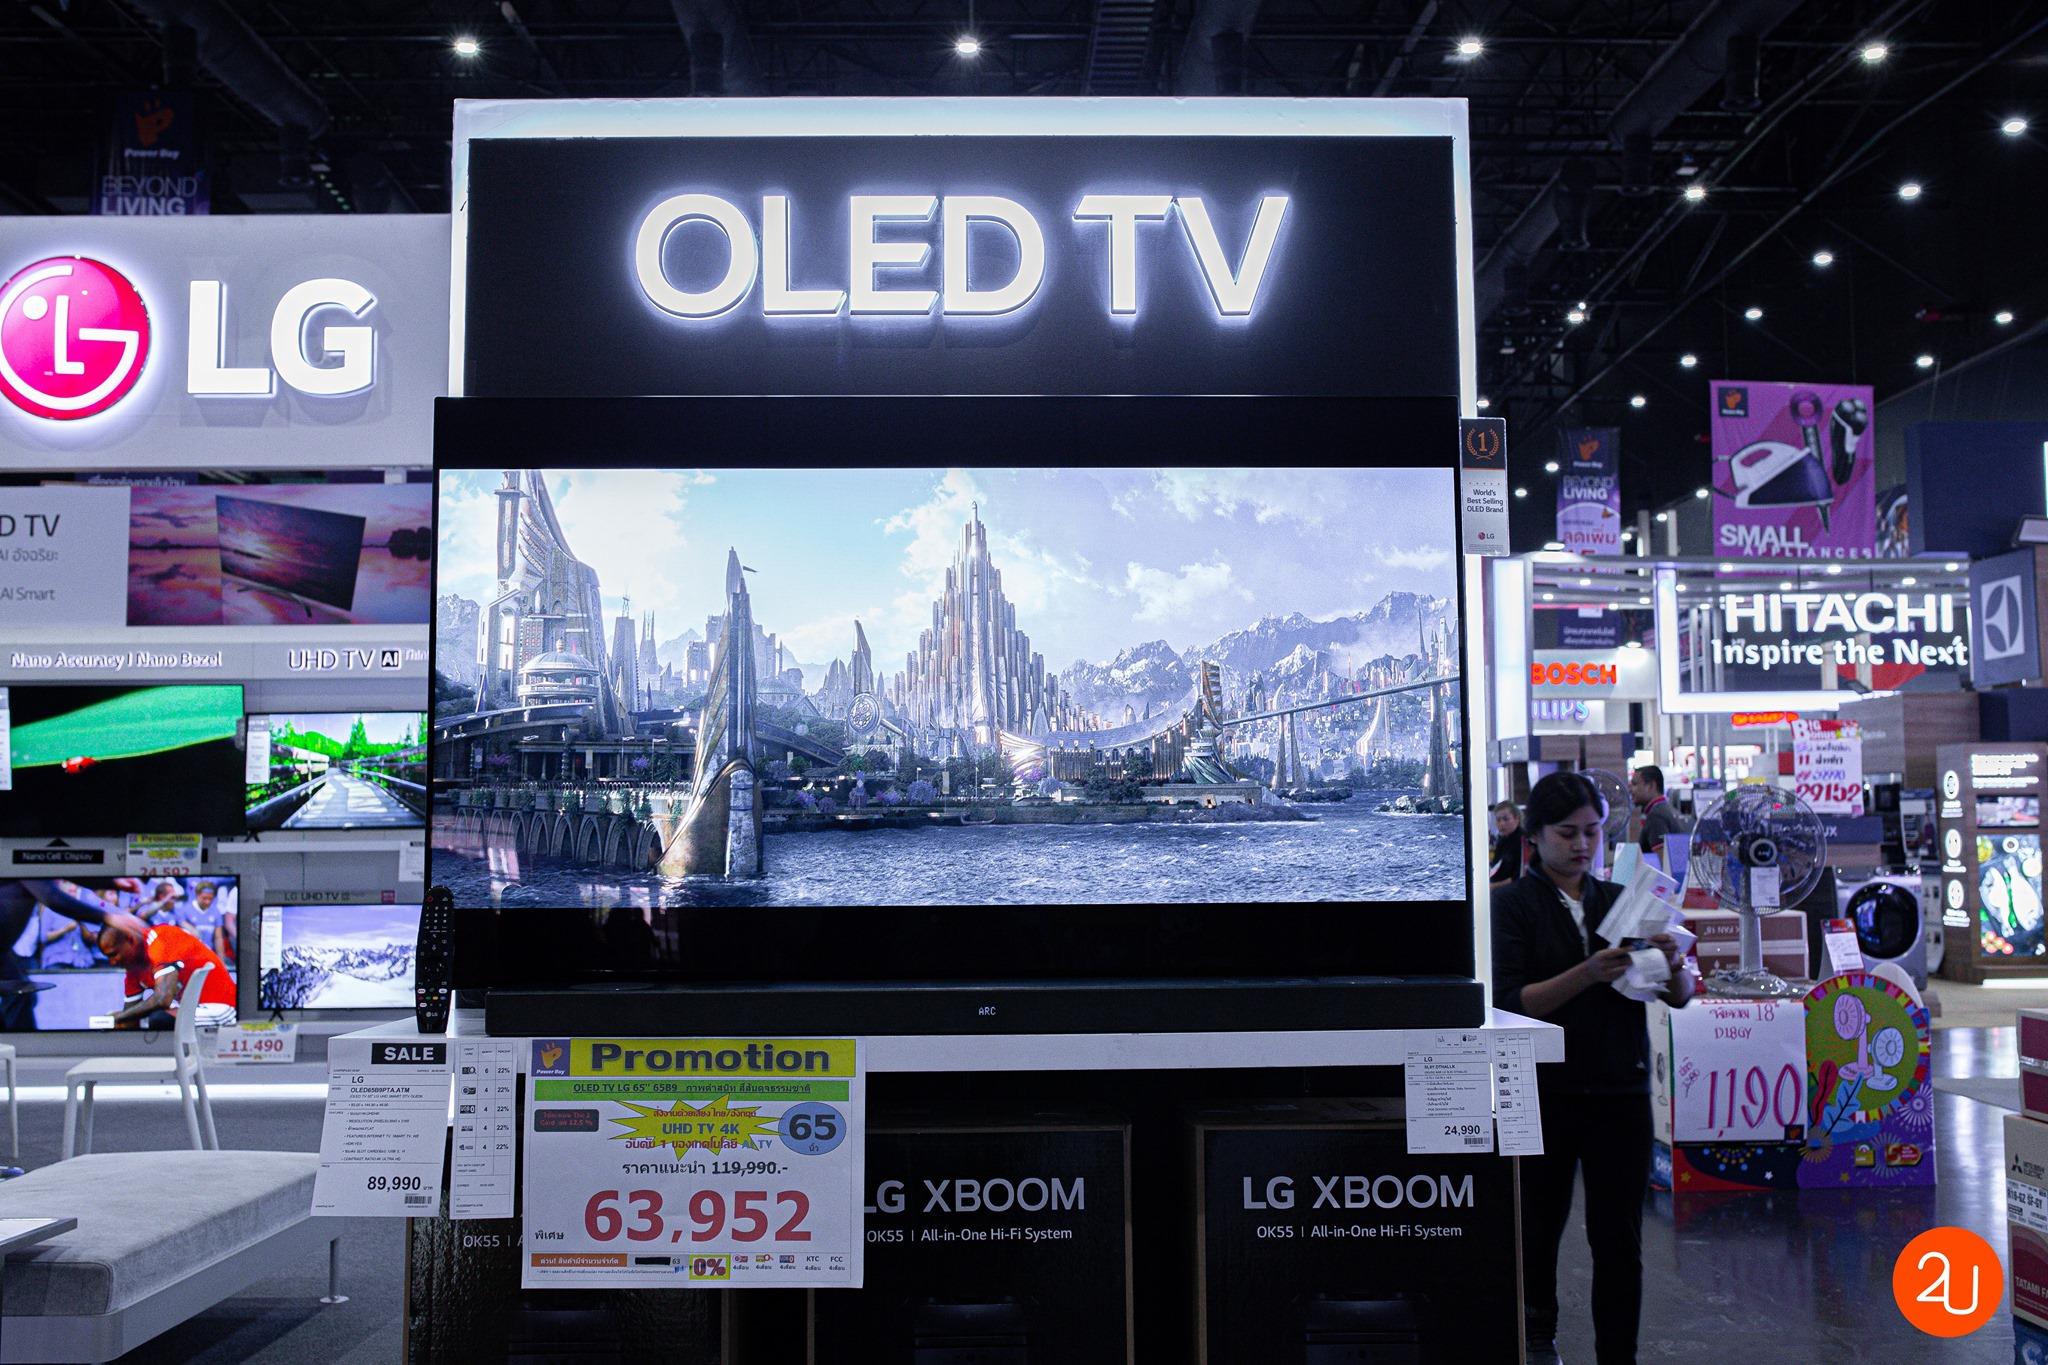 OLED TV LG 65 นิ้ว 65B9 เหลือเพียง 63,952.- (จากปกติ 89,990.-)